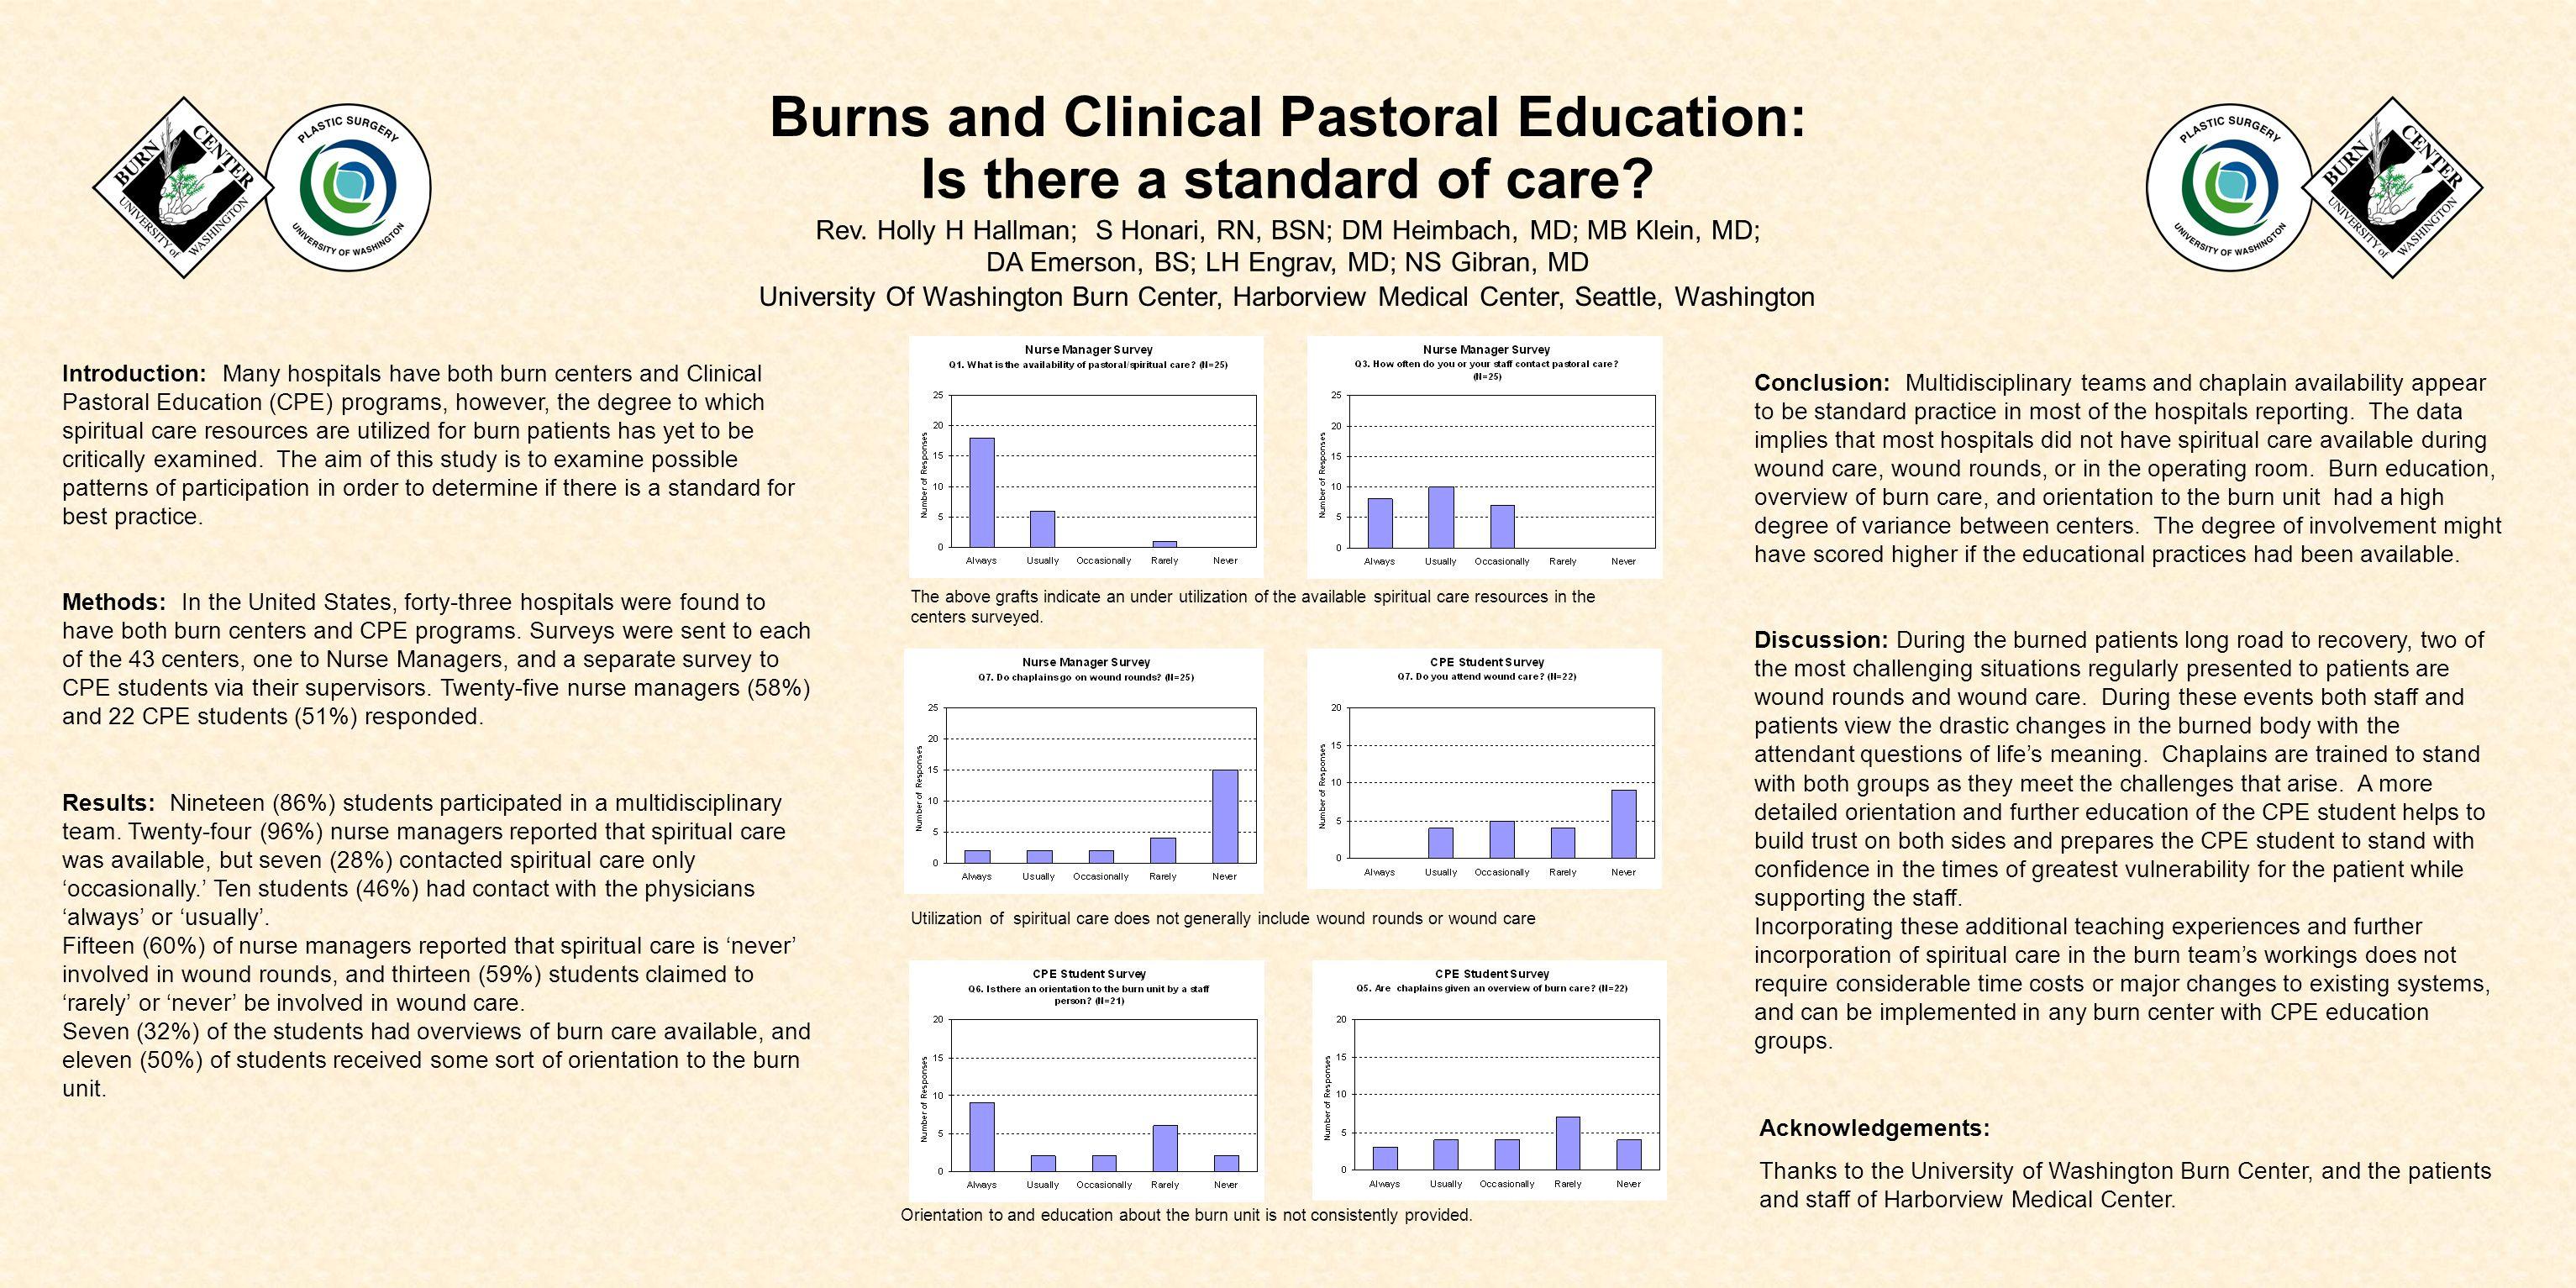 Rev. Holly H Hallman; S Honari, RN, BSN; DM Heimbach, MD; MB Klein, MD; DA Emerson, BS; LH Engrav, MD; NS Gibran, MD Burns and Clinical Pastoral Educa